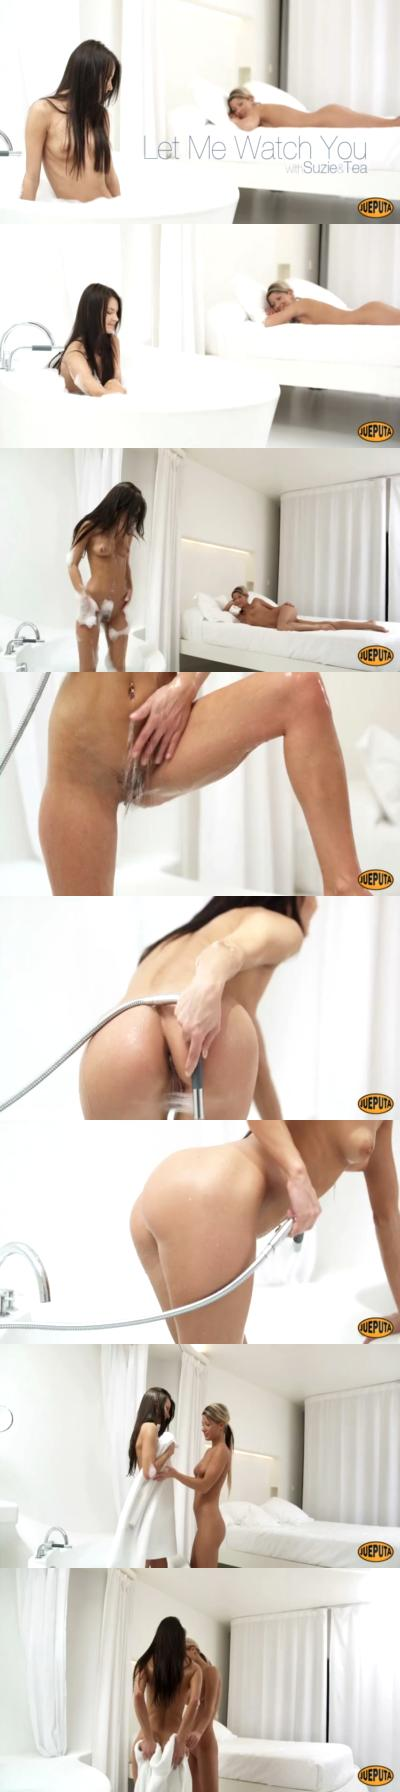 Webcam poledancing bts pussy cumshot 3